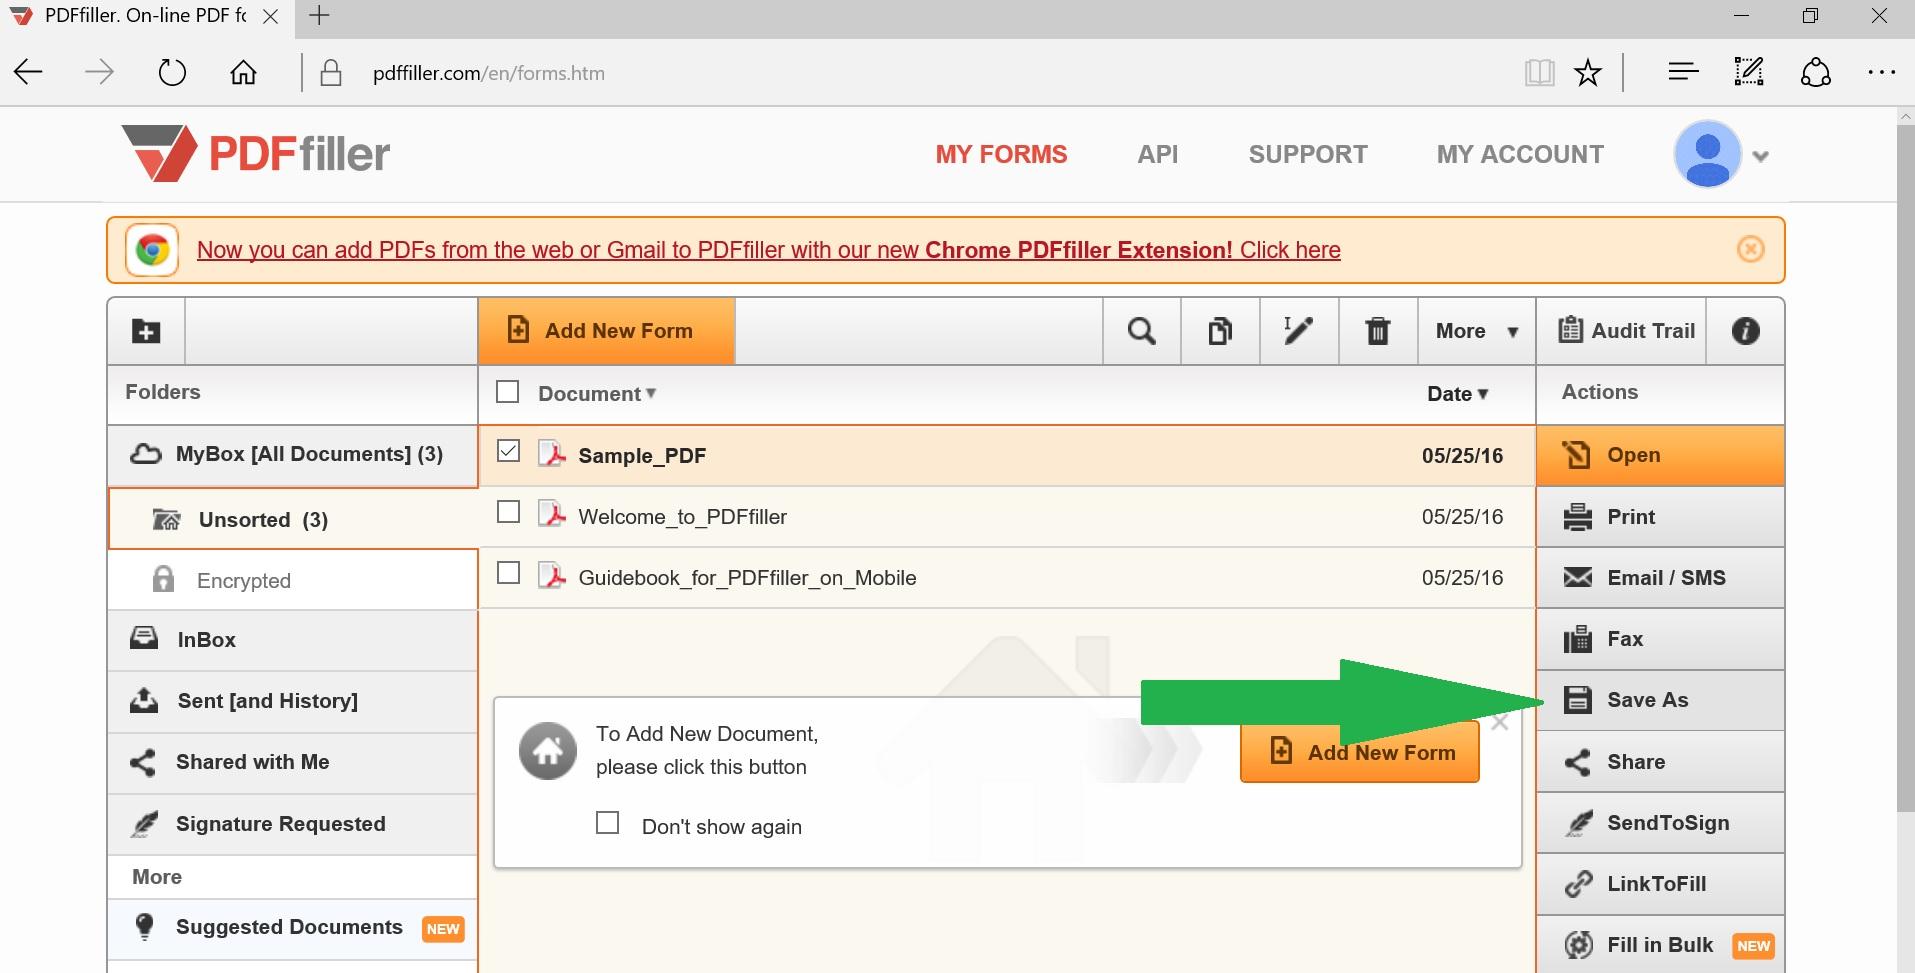 Convert Pdf To Excel Spreadsheet Online With Regard To Convertir Pdf To Excel  Steadlane.club